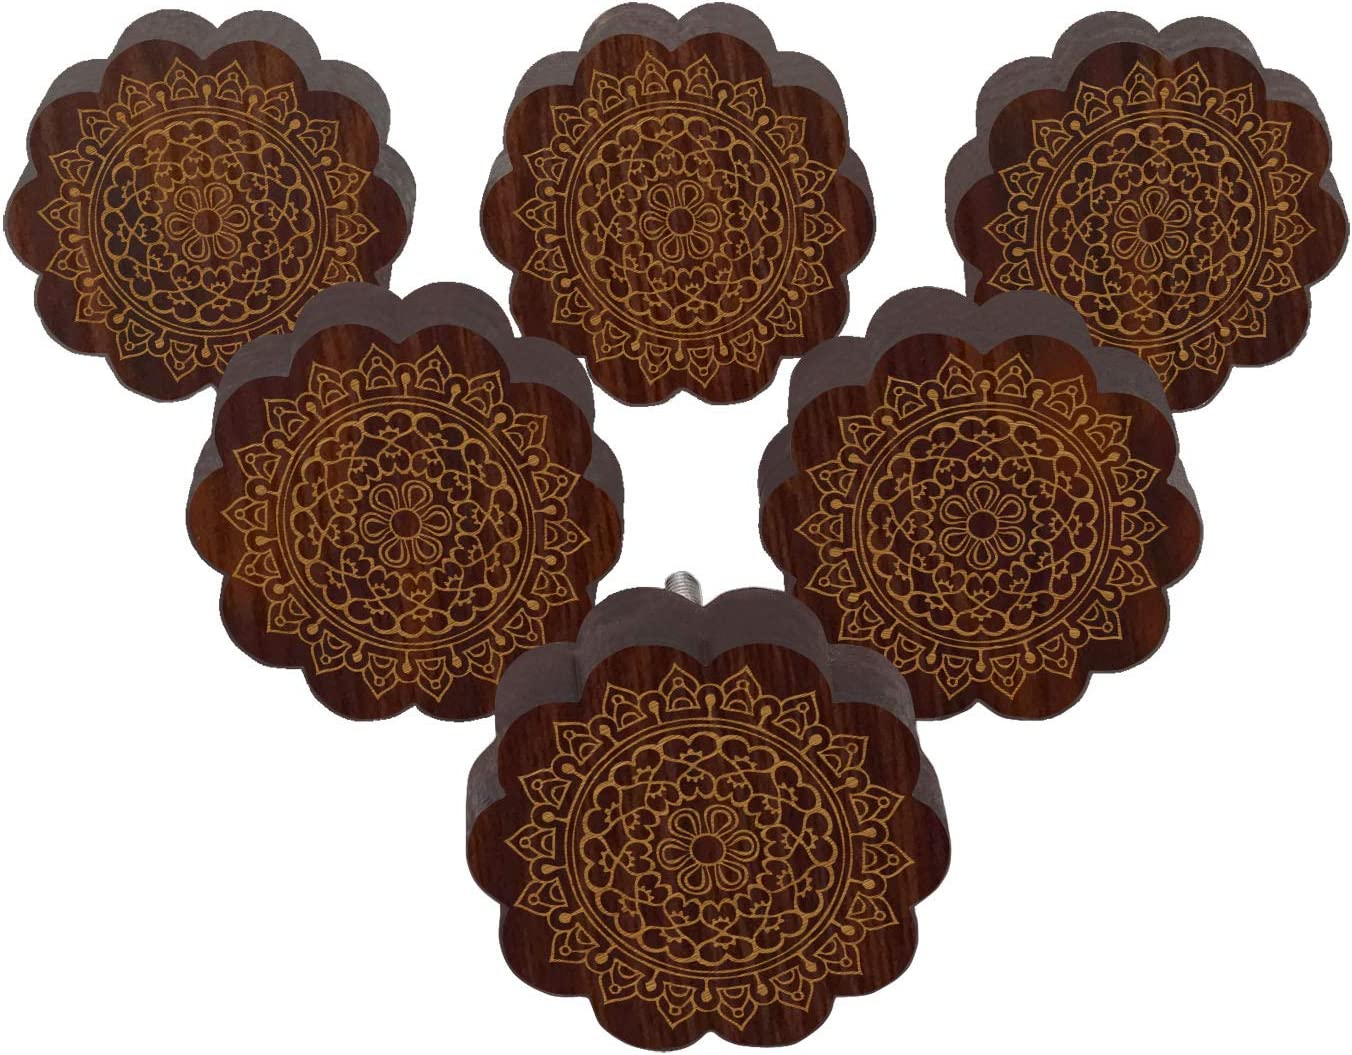 IBA Indianbeautifulart Braun graviert Kn/öpfe 10 Stk M/öbel Holz Jakobsmuschel Kn/öpfe rustikale Schublade ziehen